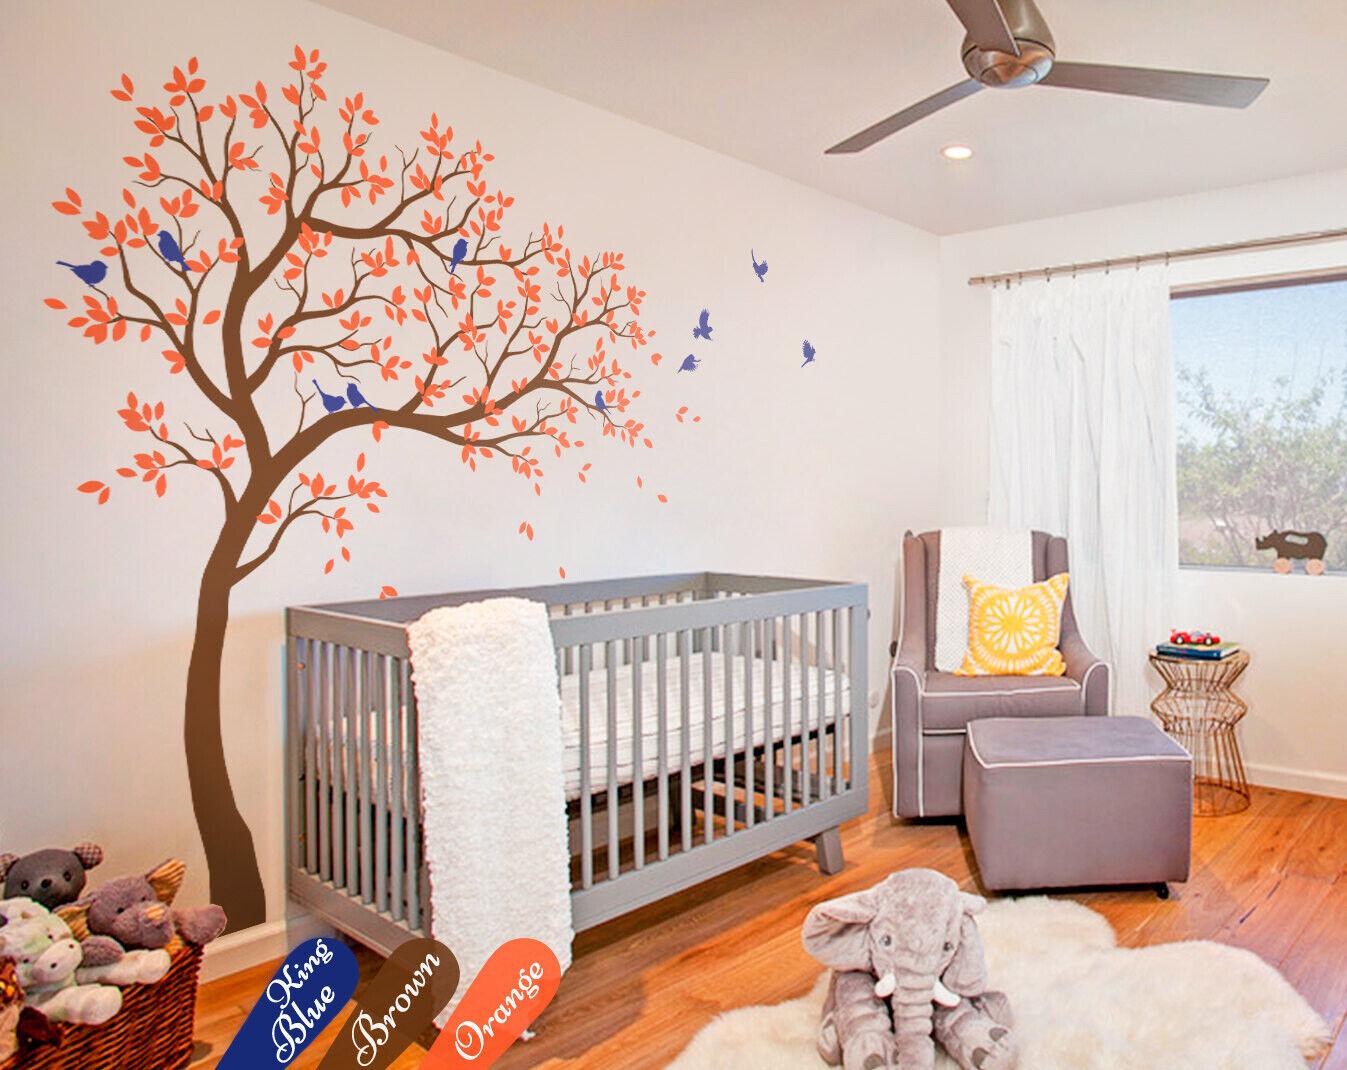 Nursery tree wall decal Kids Room tree decoration Baby-room wall sticker KW032